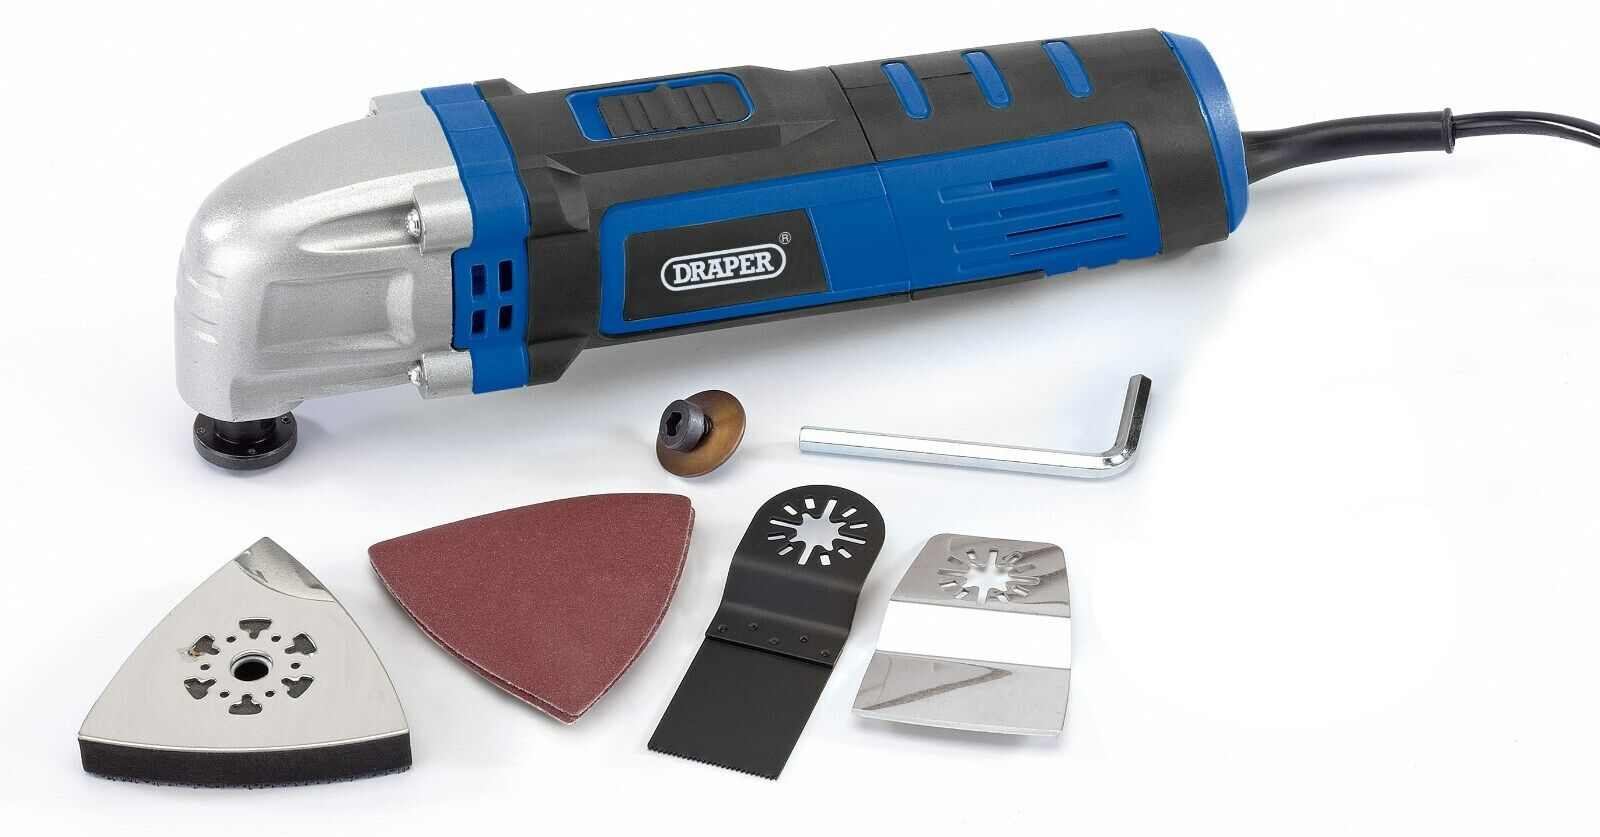 Genuine DRAPER Storm Force Oscillating Multi-Tool Kit 83648 400W